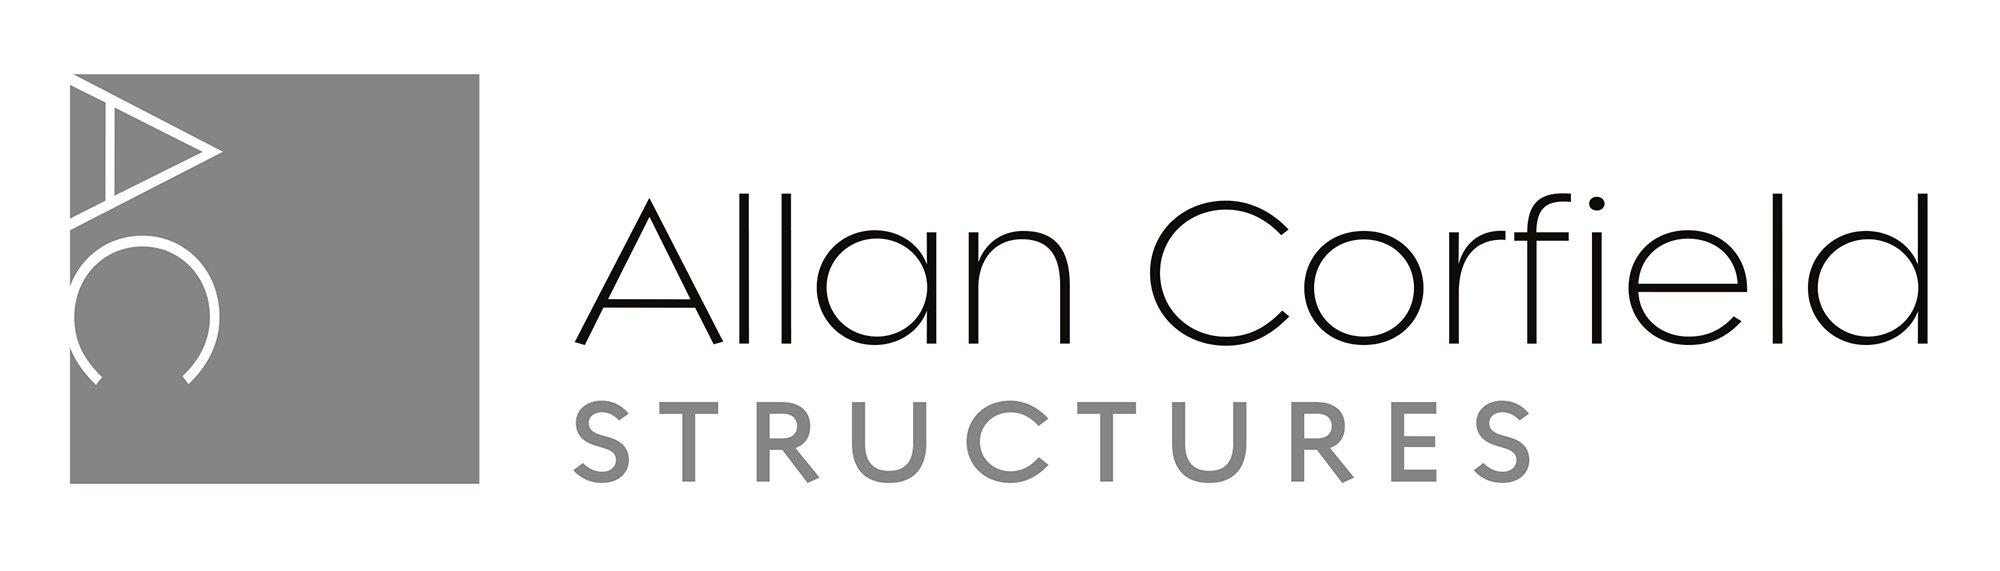 Allan Corfield Structures Ltd